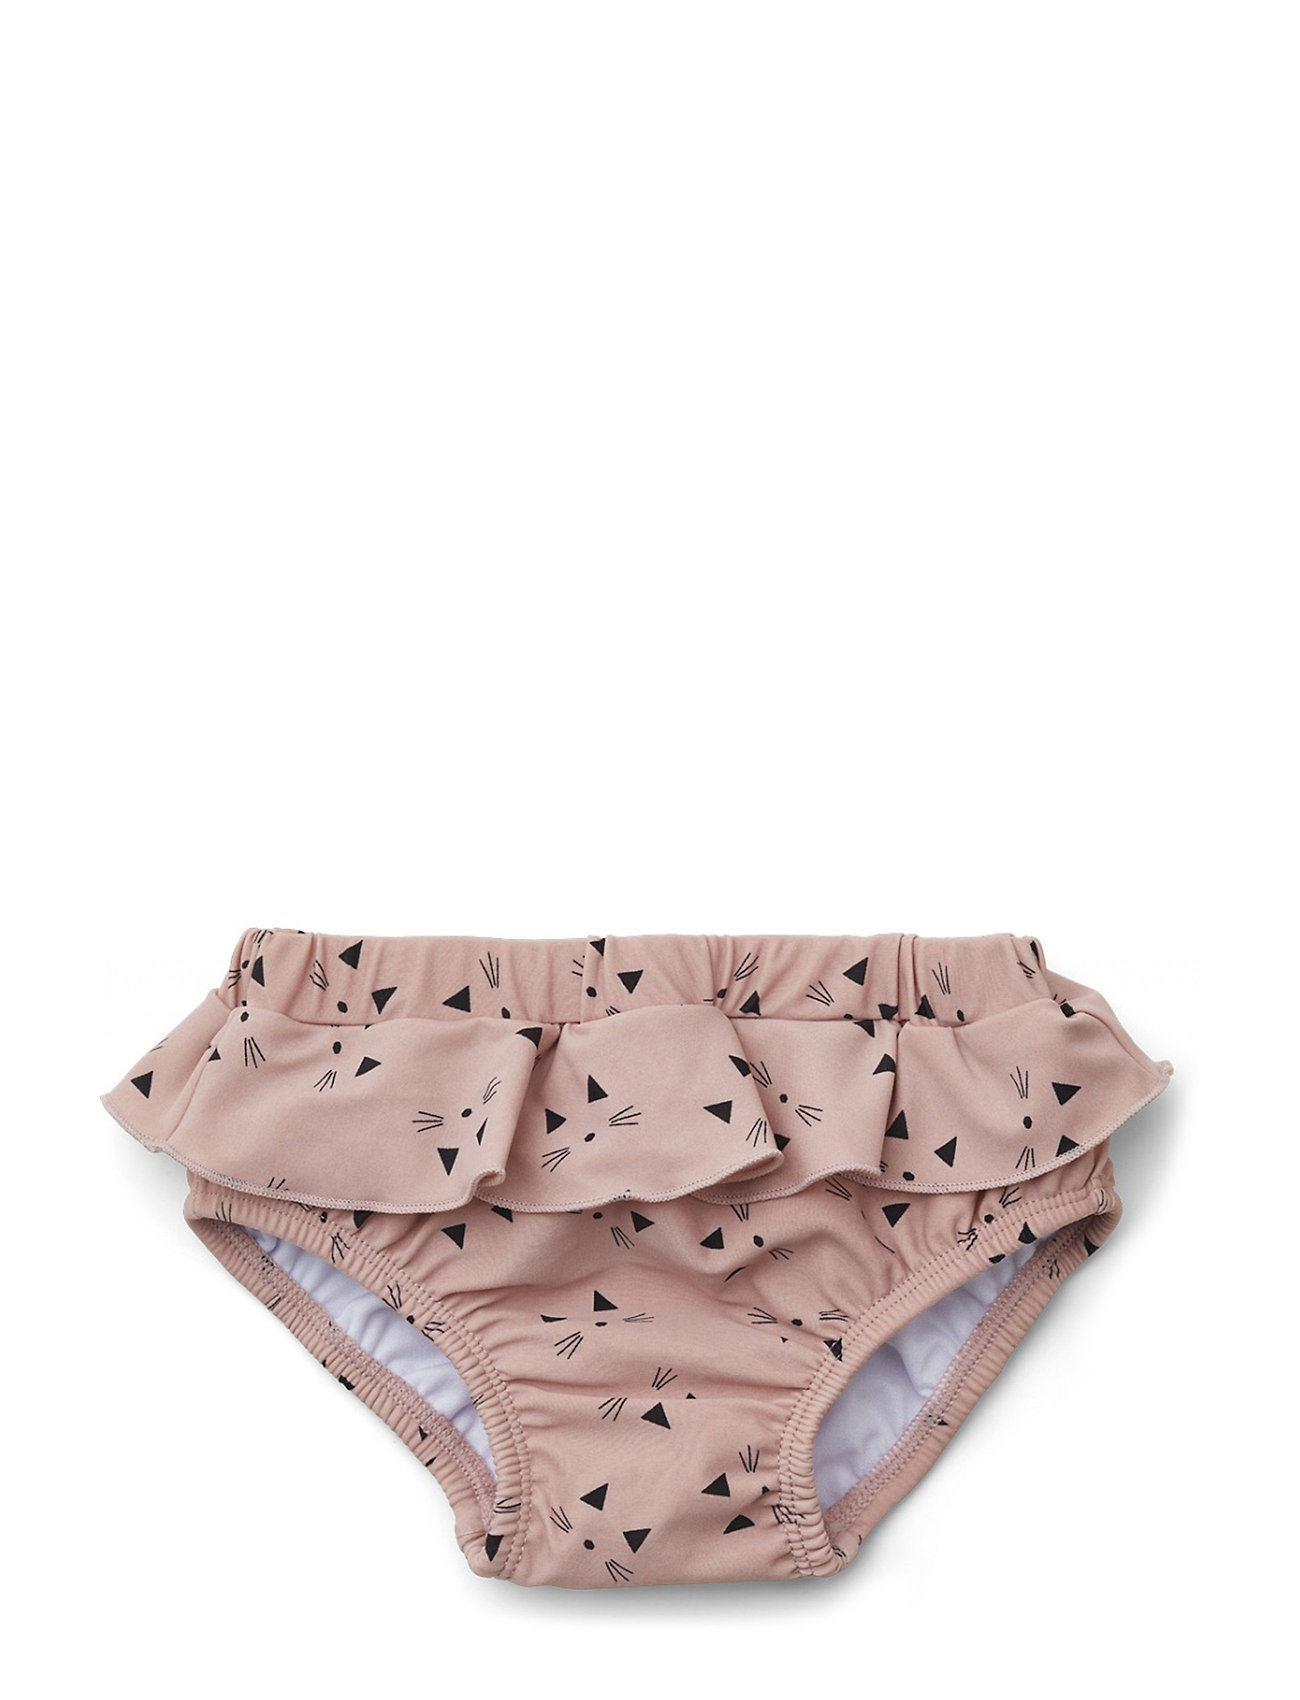 9623cc77a8 Elise baby girl swim pants